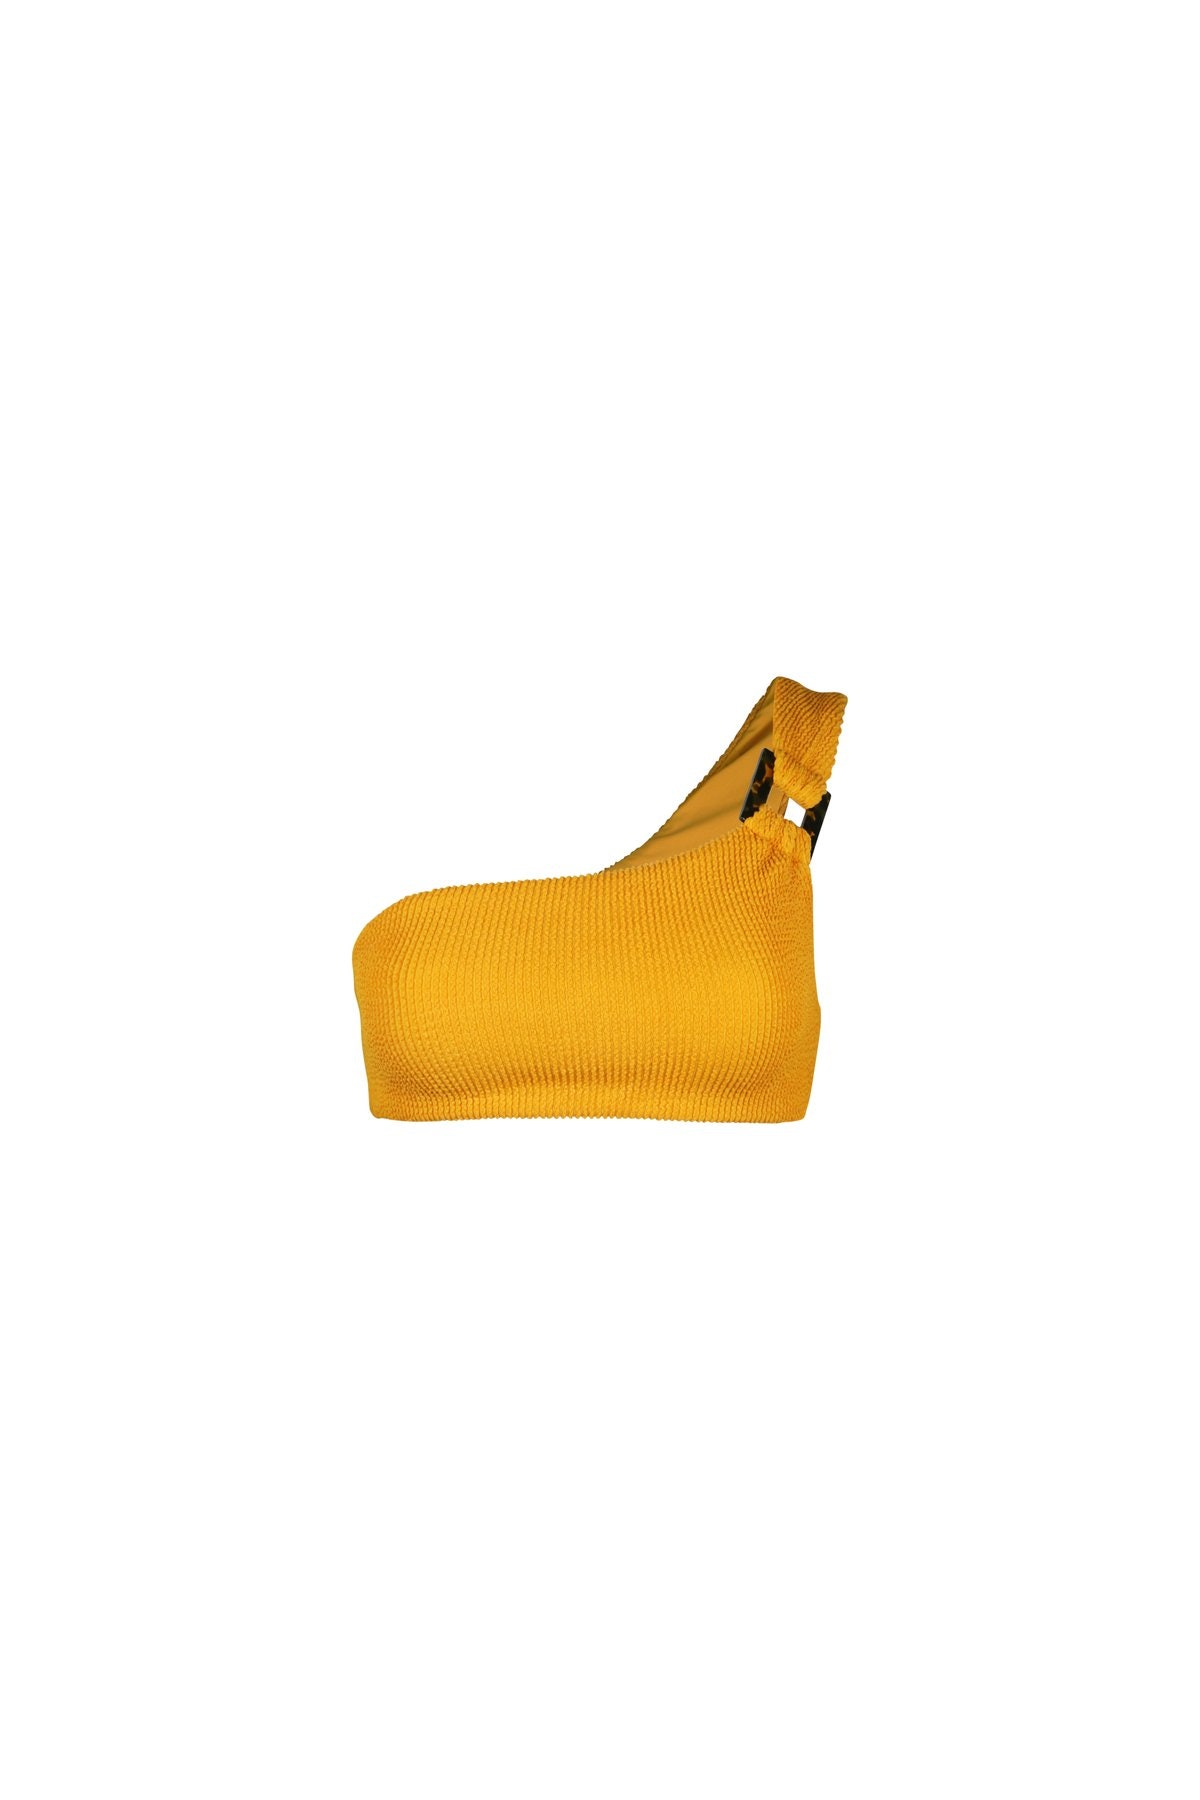 Chromat Celine Top Textured Mustard